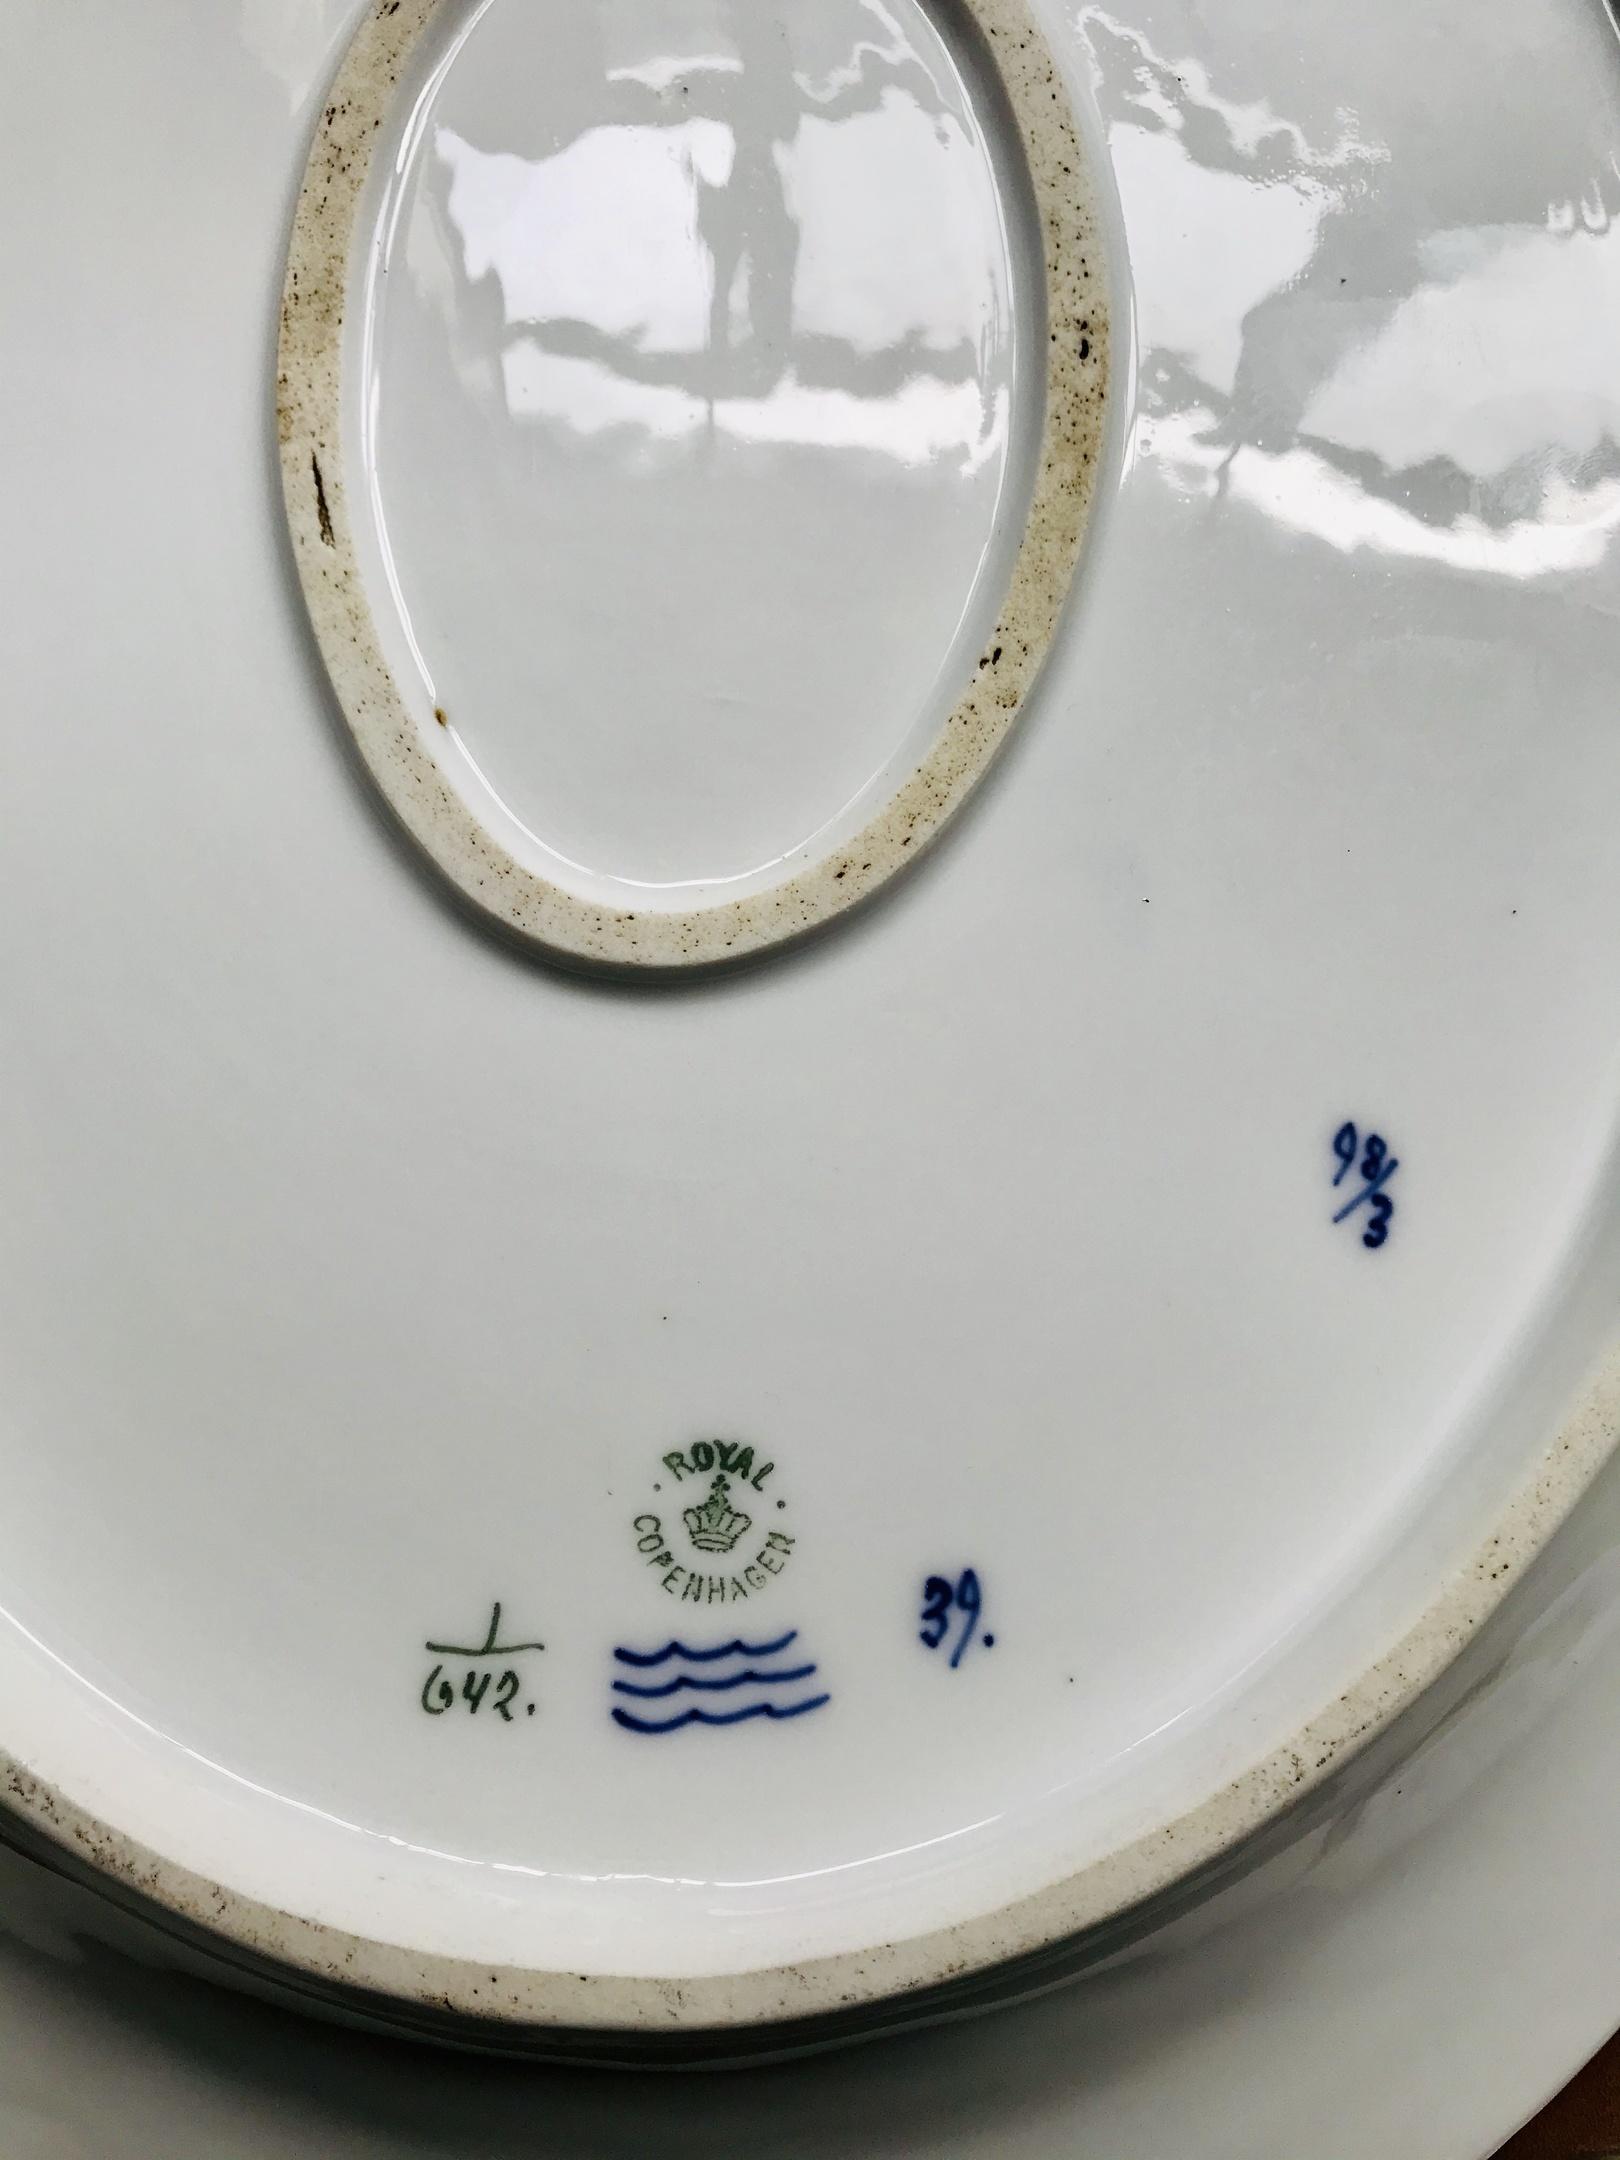 16 Oval Royal Copenhagen Platter Need Help Dating